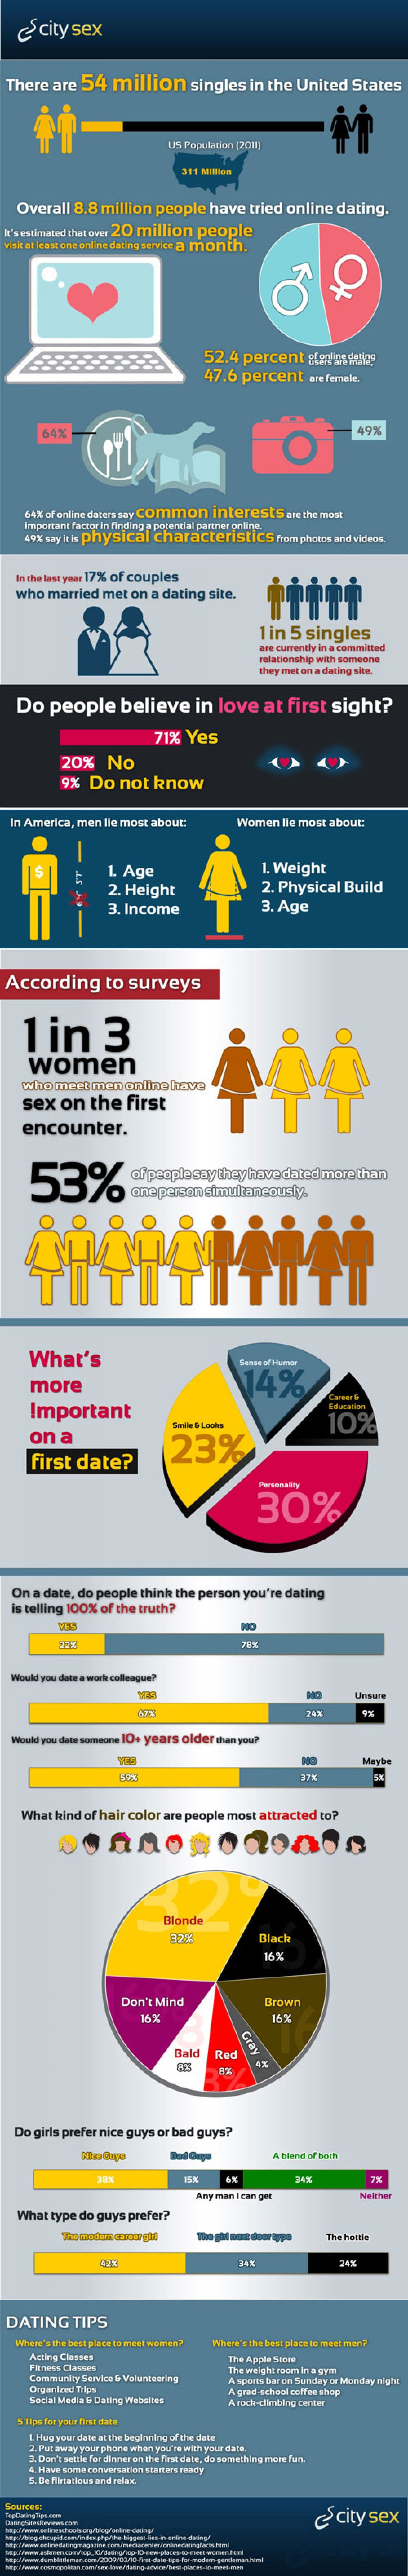 Matchmaking sociology